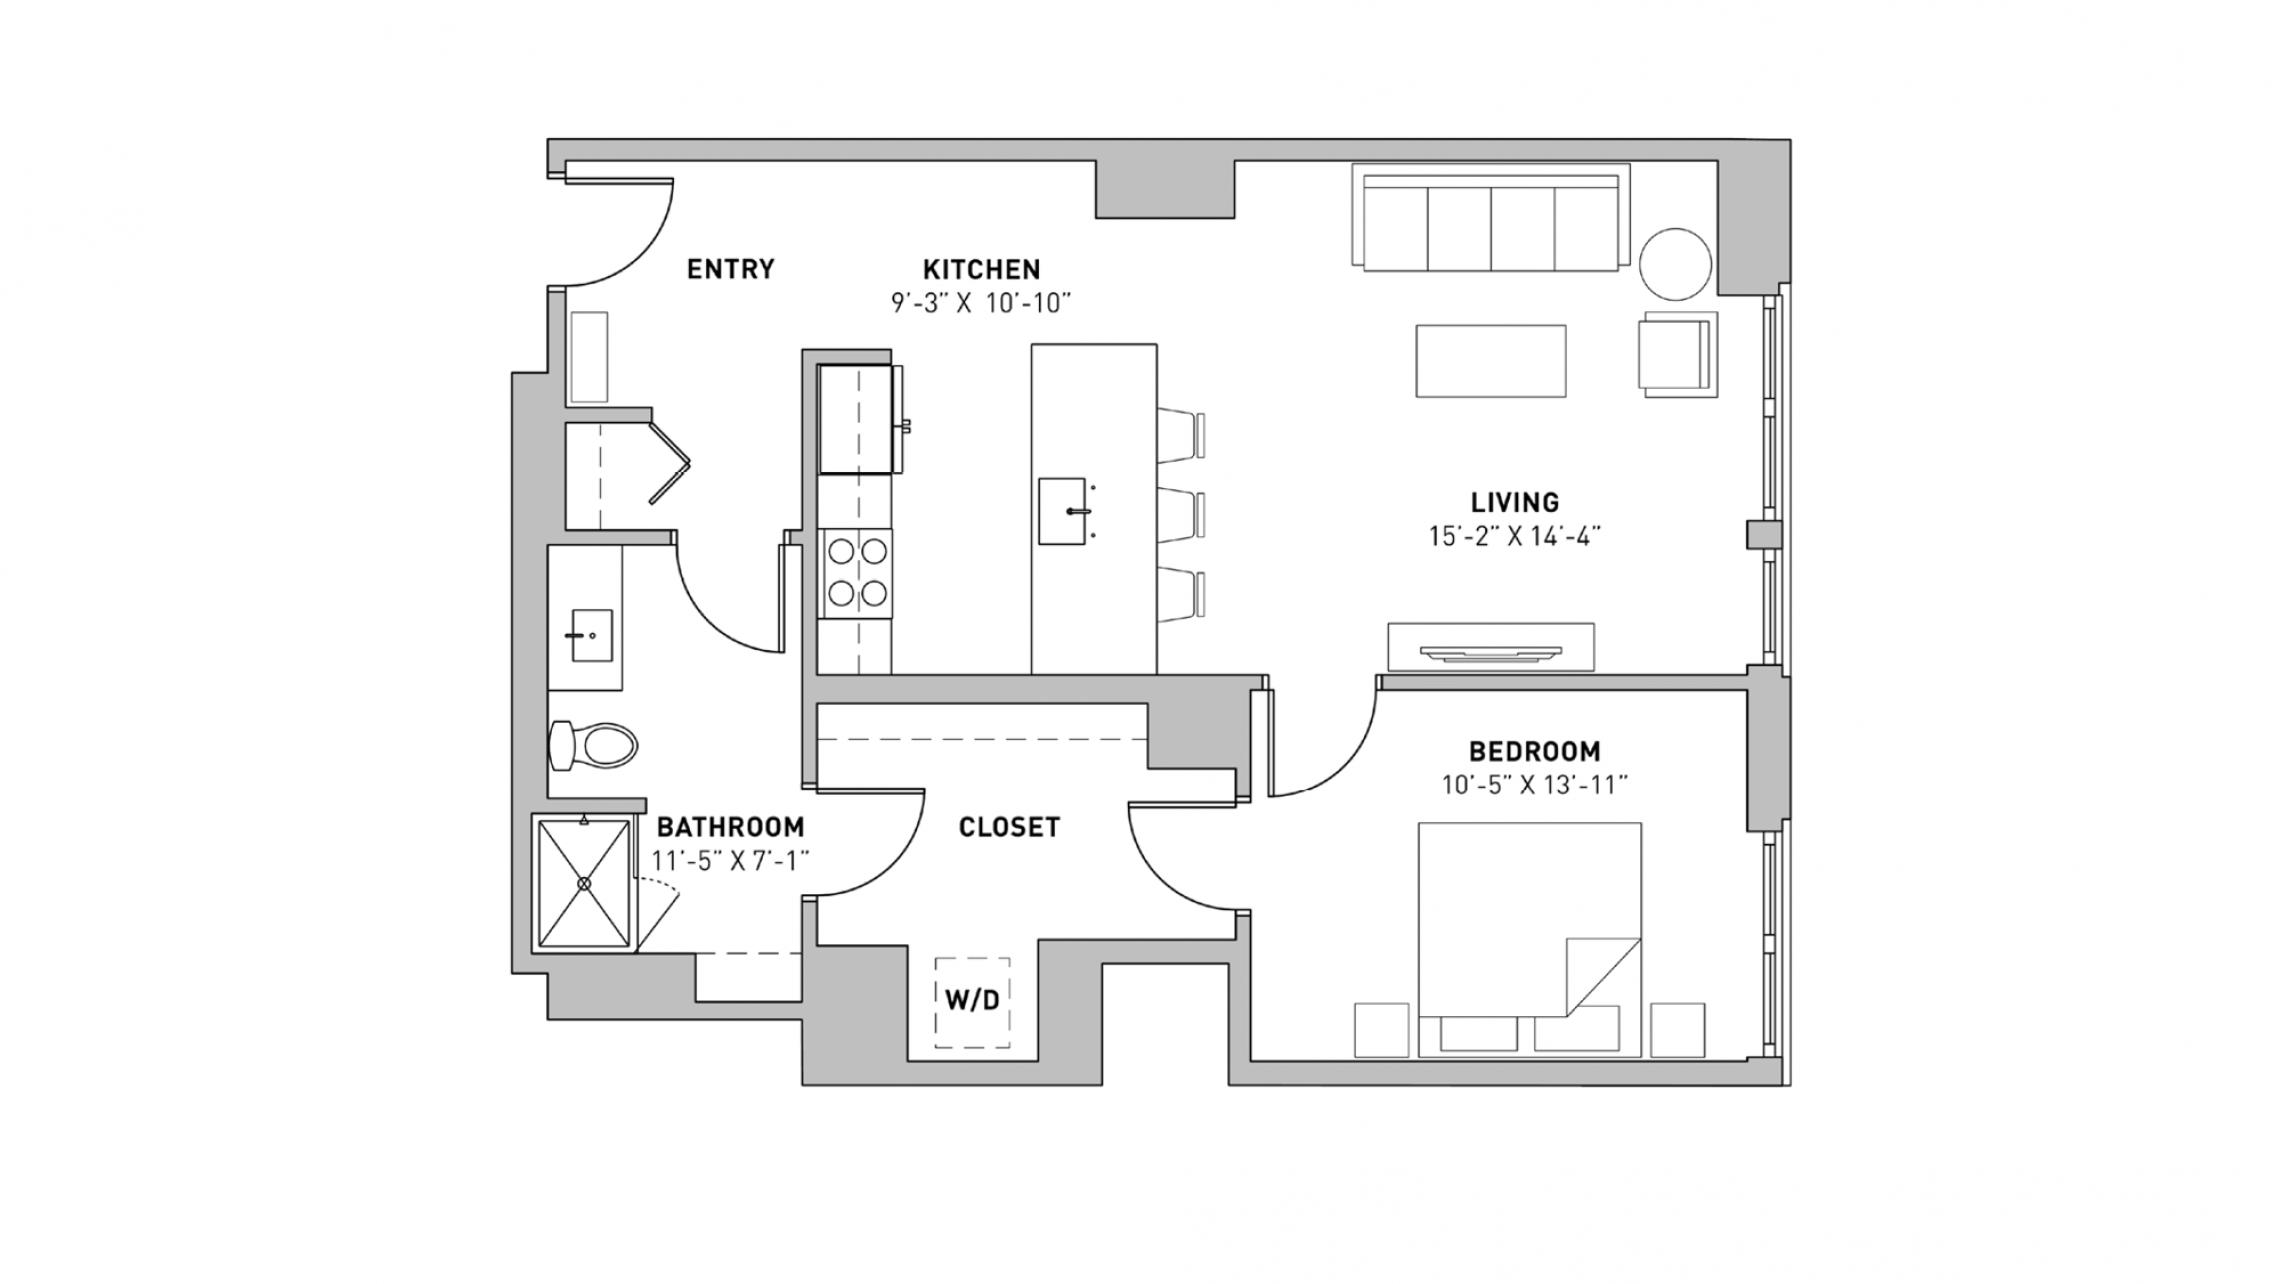 ULI The Pressman 411 - One Bedroom, One Bathroom